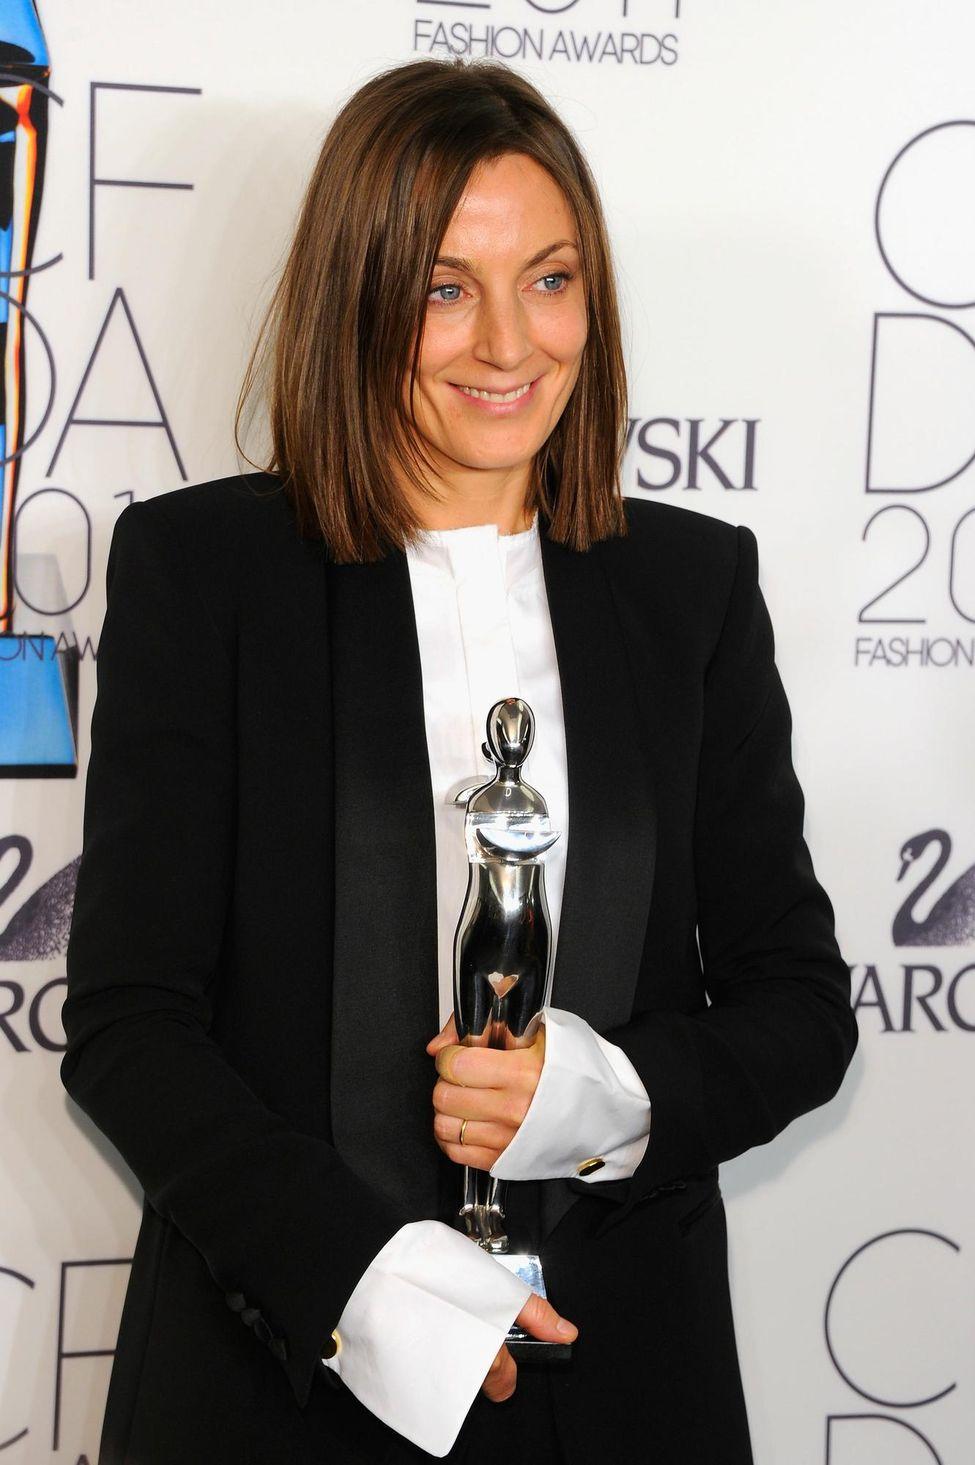 tin thời trang phoebe philo tại lễ trao giải international awards 2011